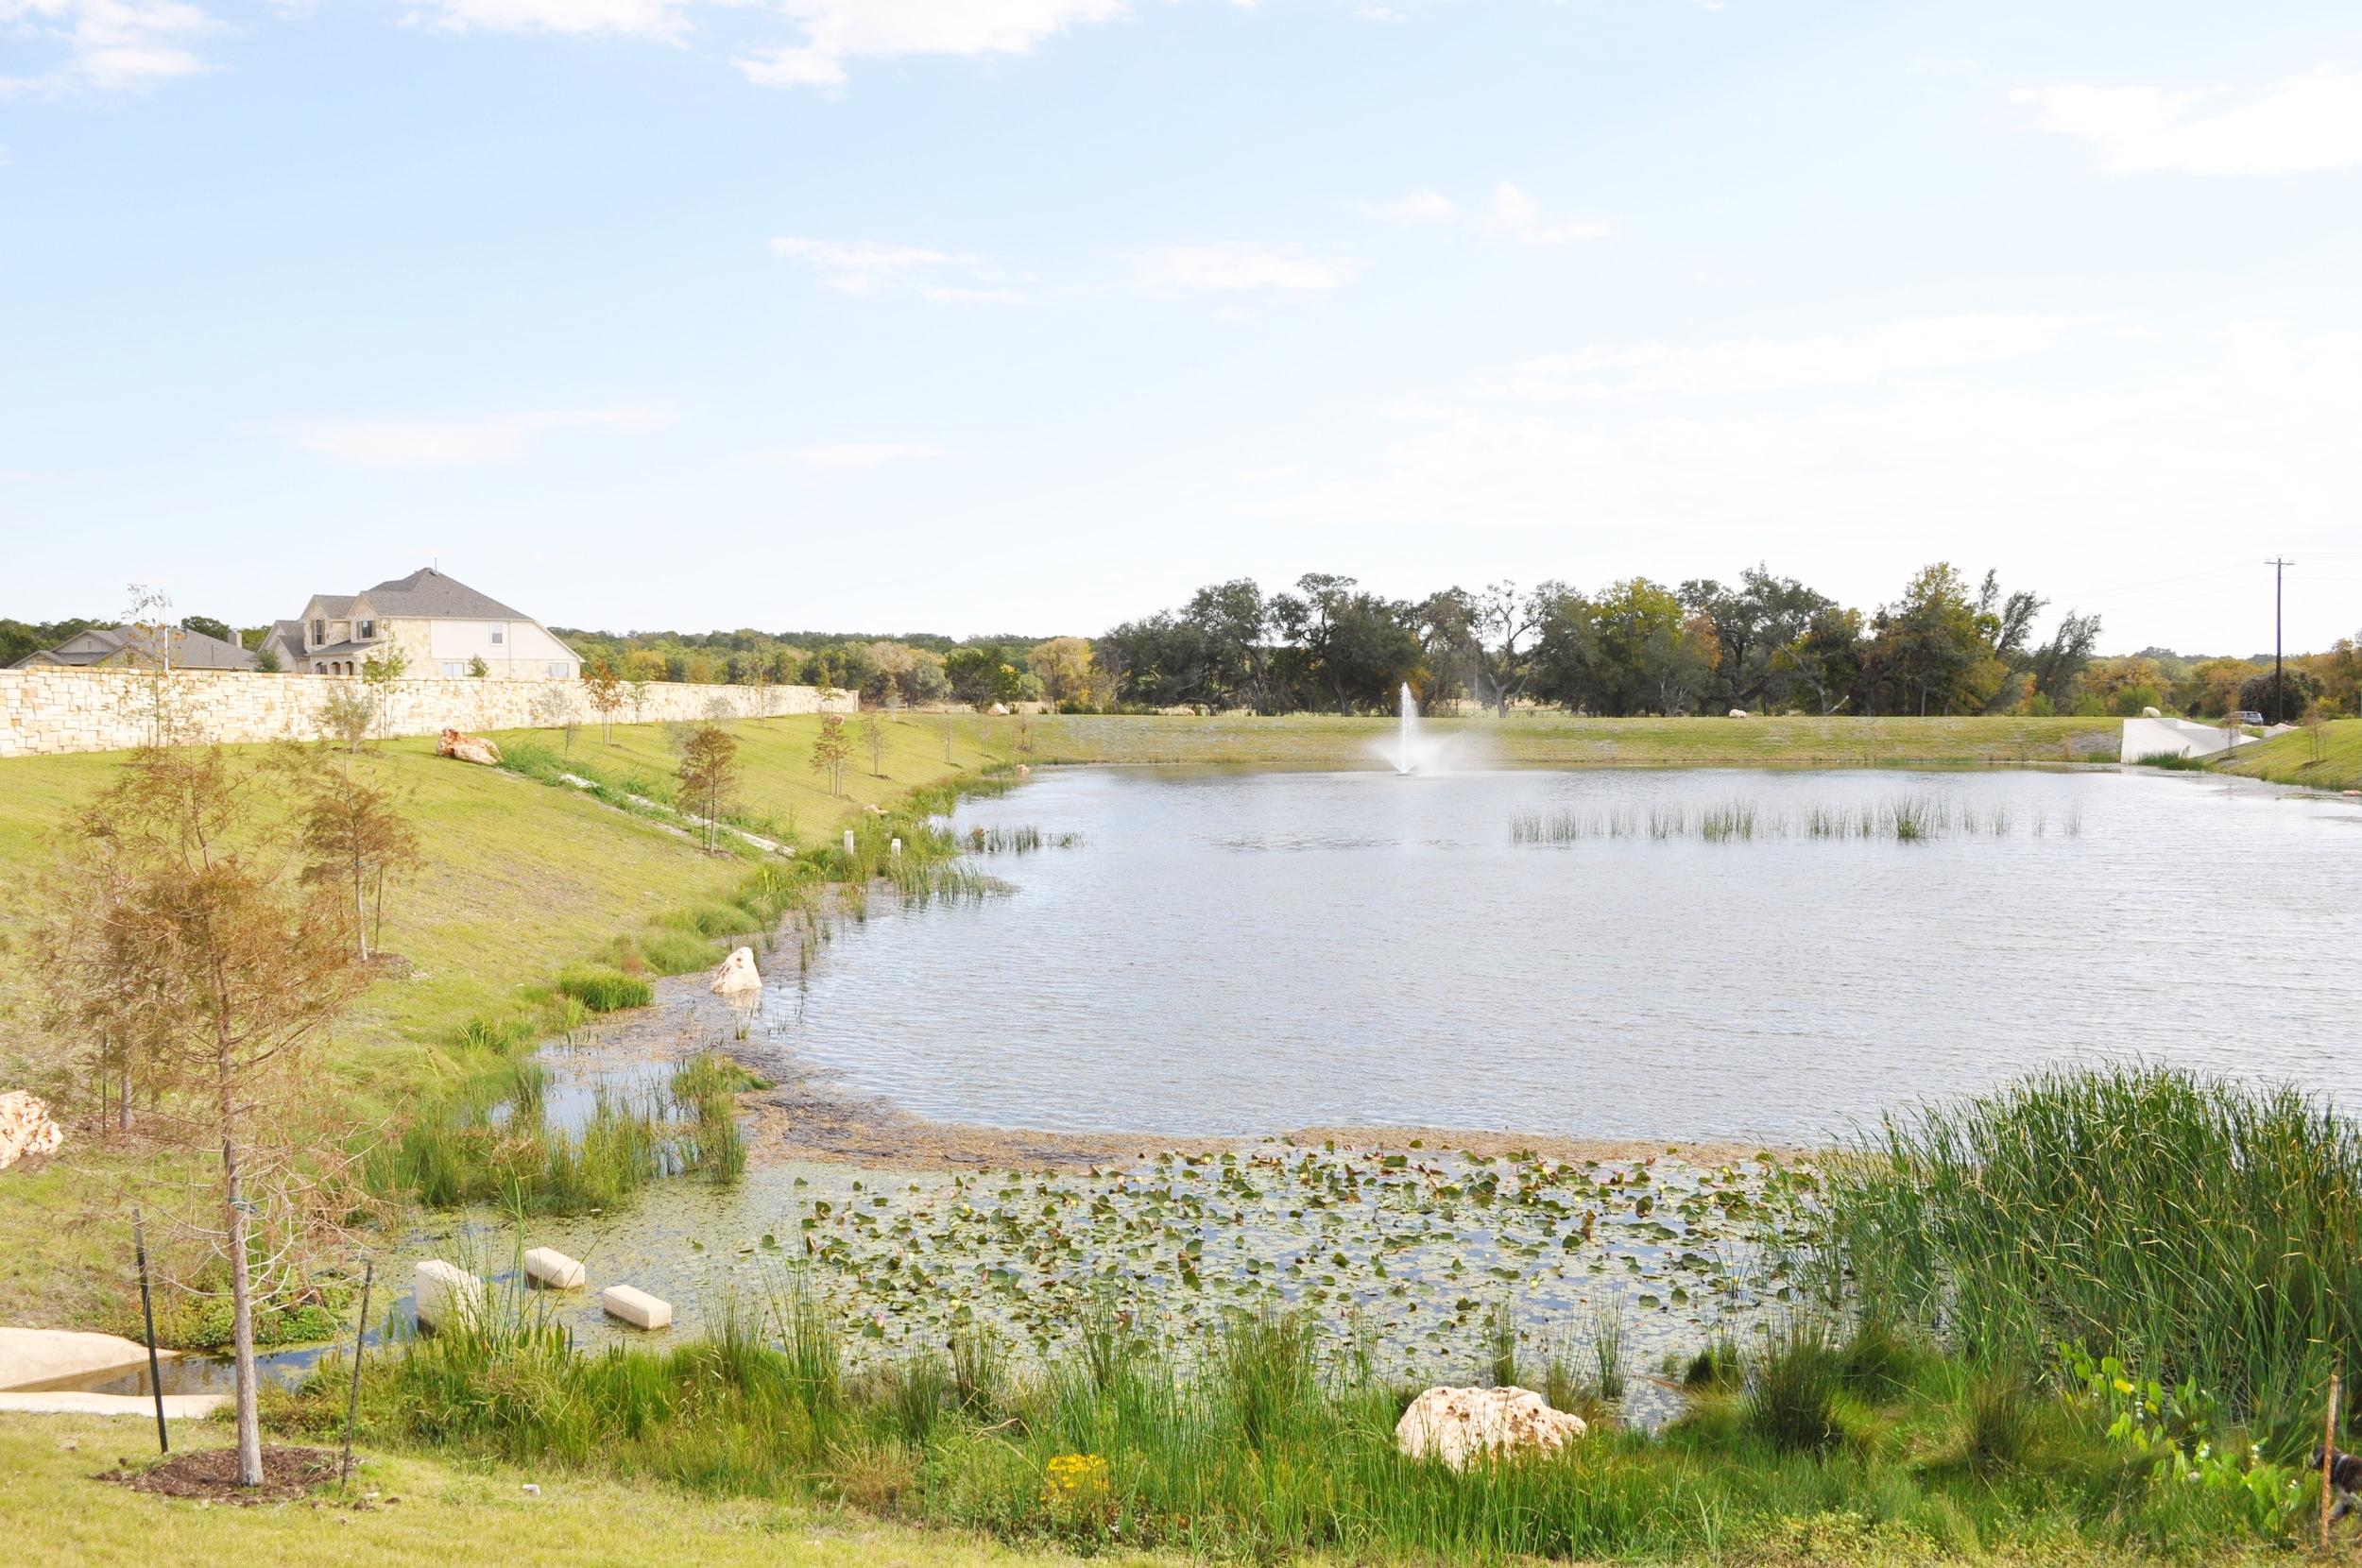 Wetland Mitigation Planning and Monitoring